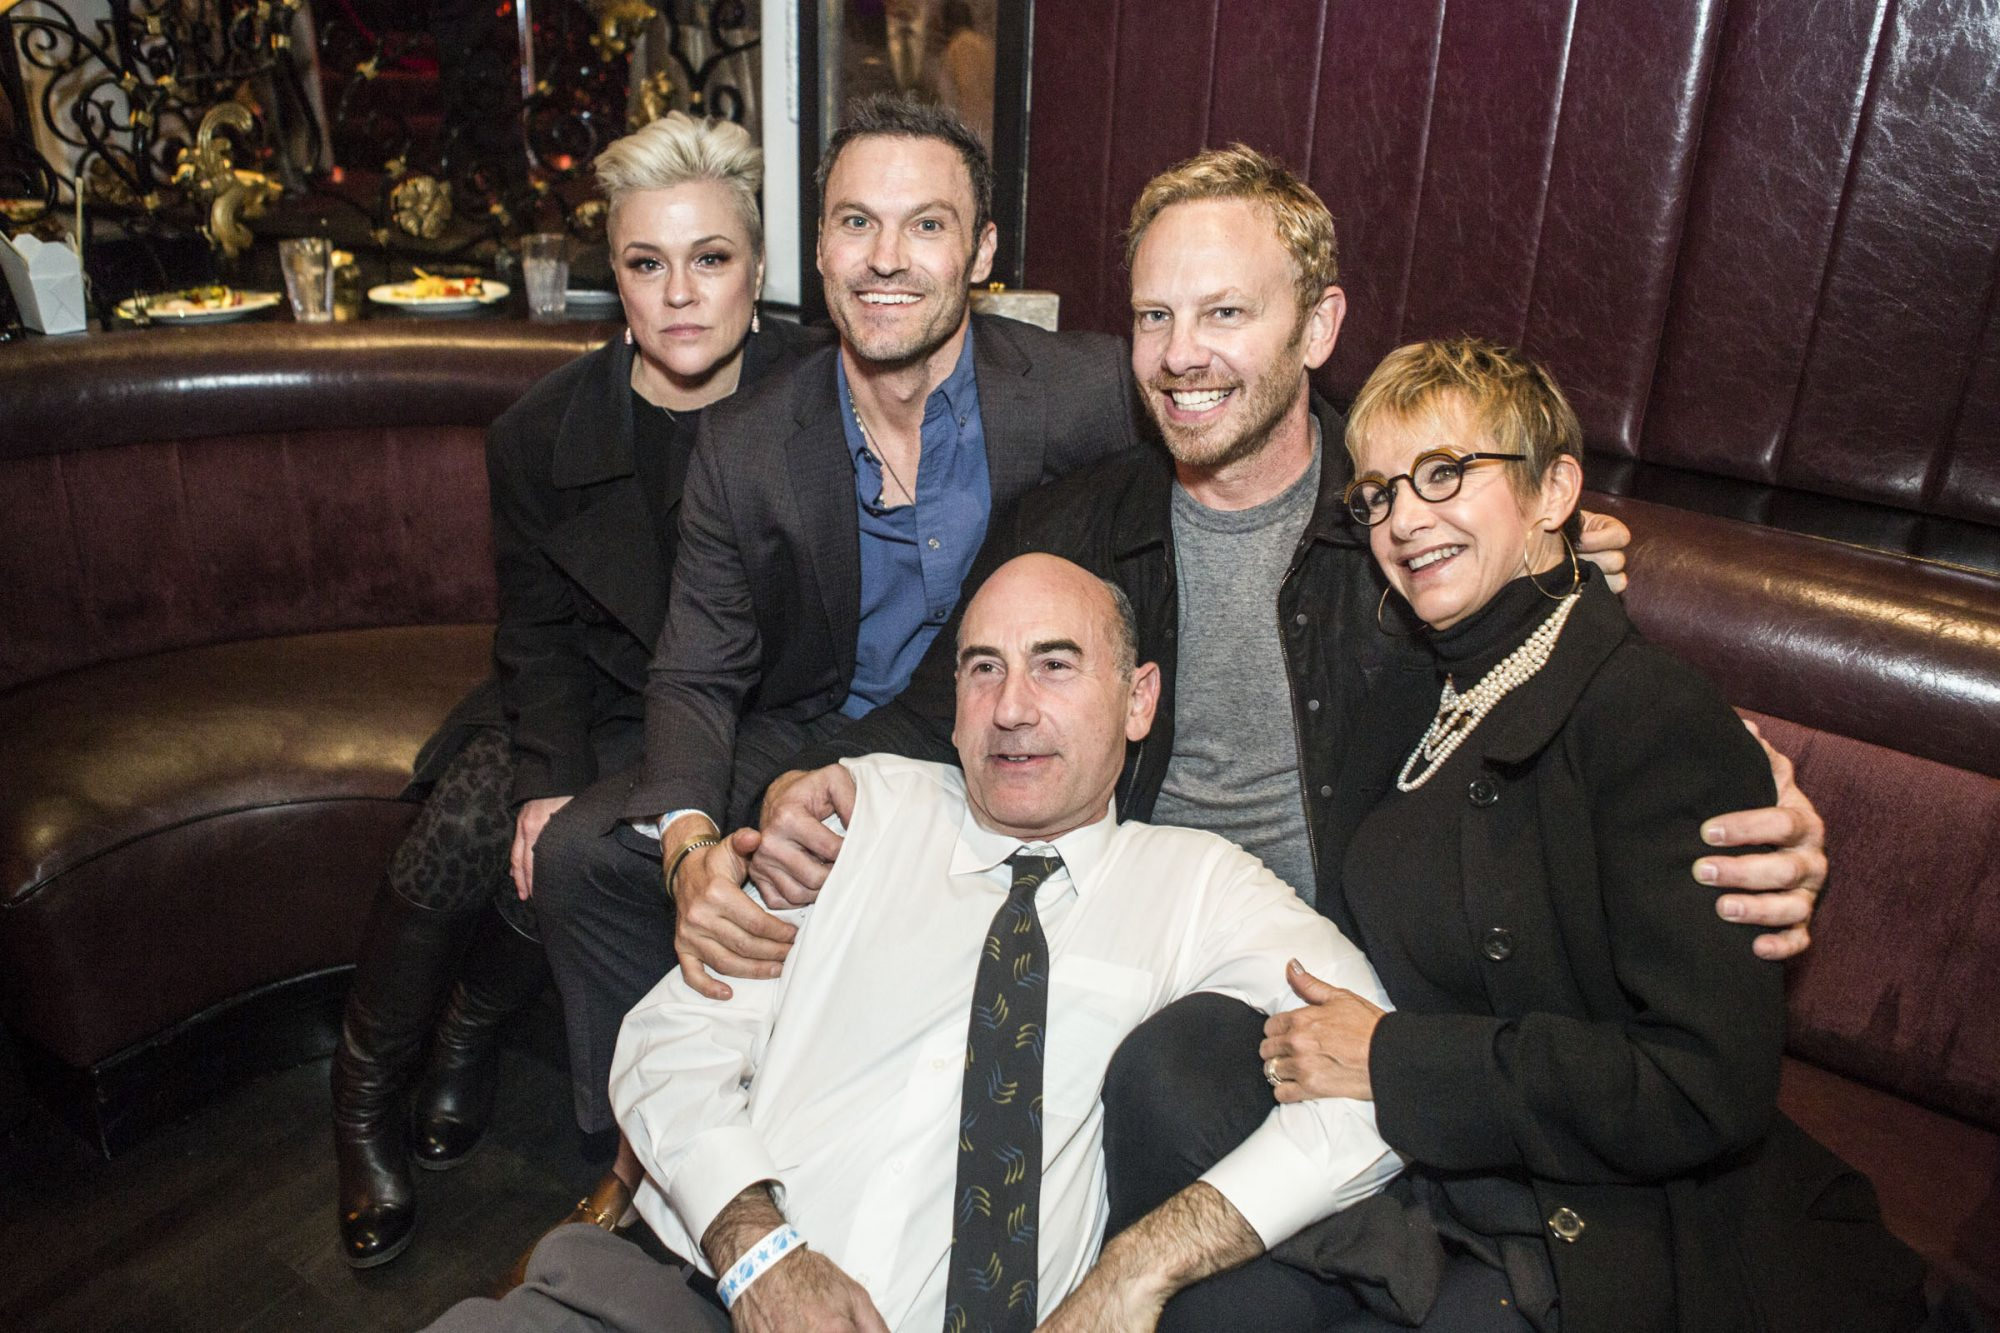 90210 stars Christine Elise, Brian Austin Green, Ian Ziering, Gabrielle Carteris and James Eckhouse